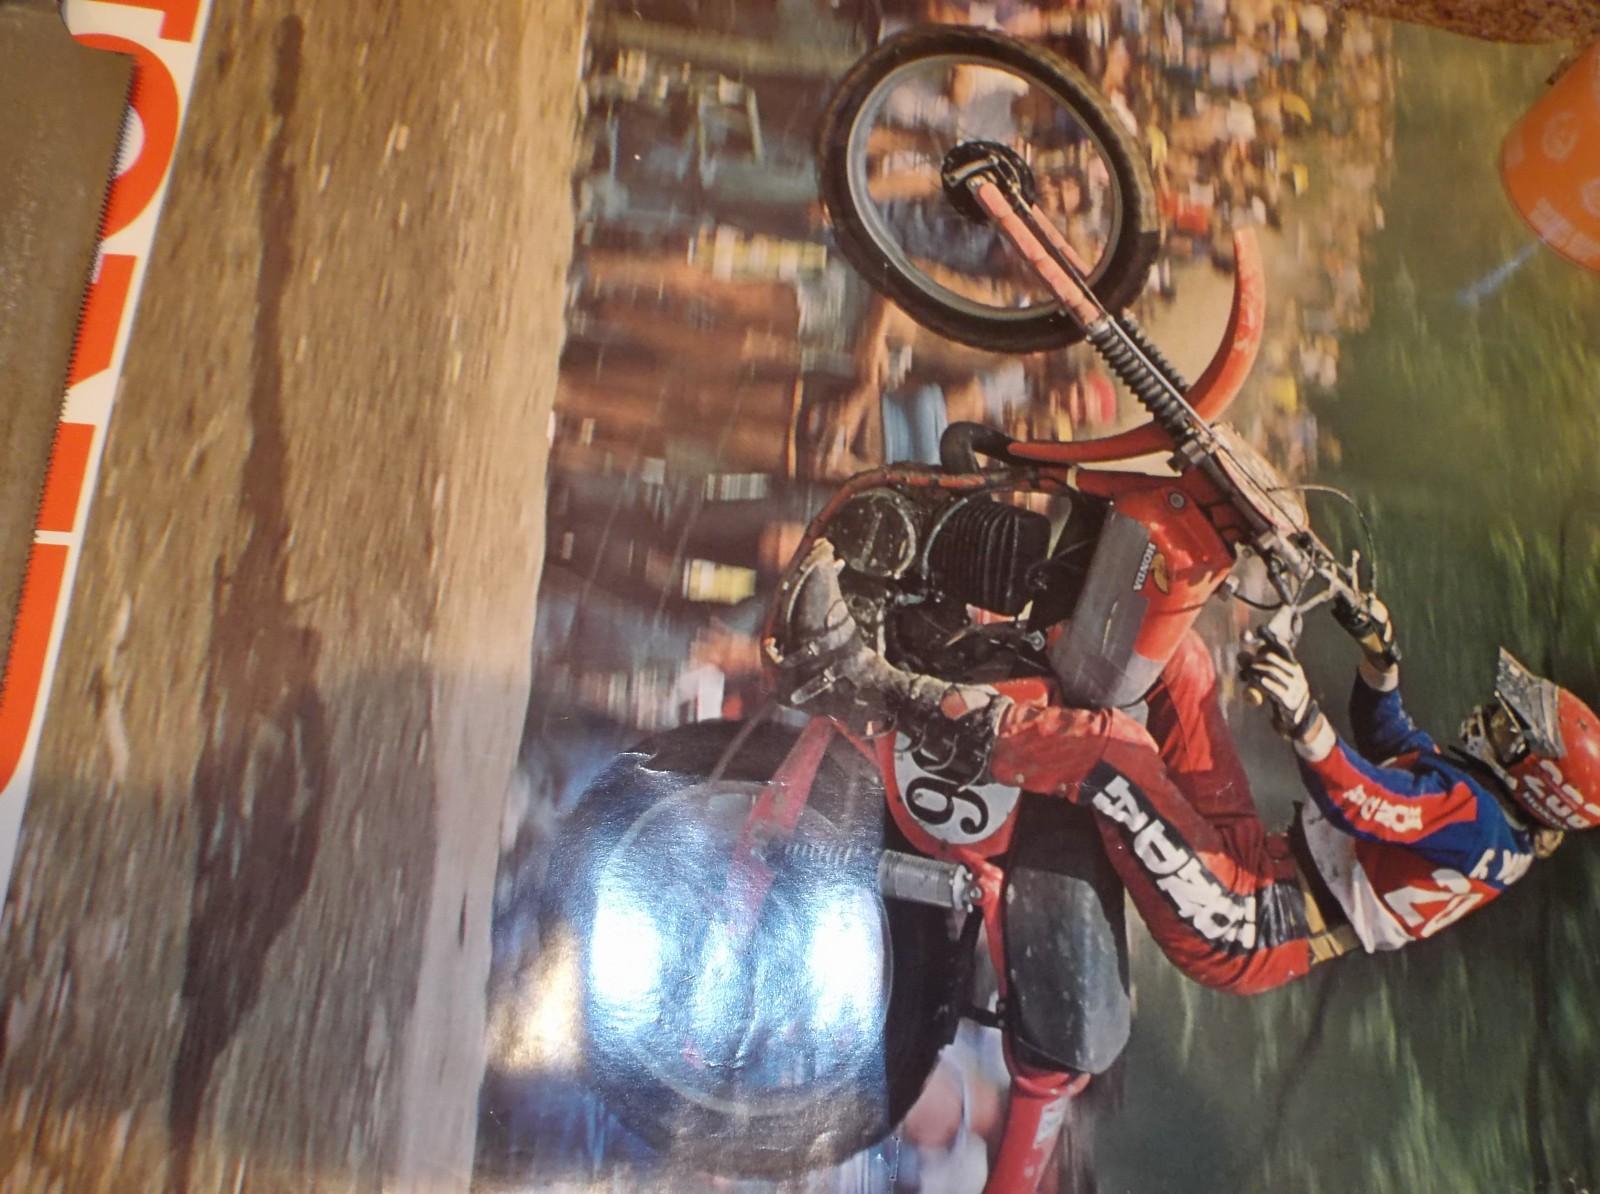 DSCF1647 - Reds - Motocross Pictures - Vital MX